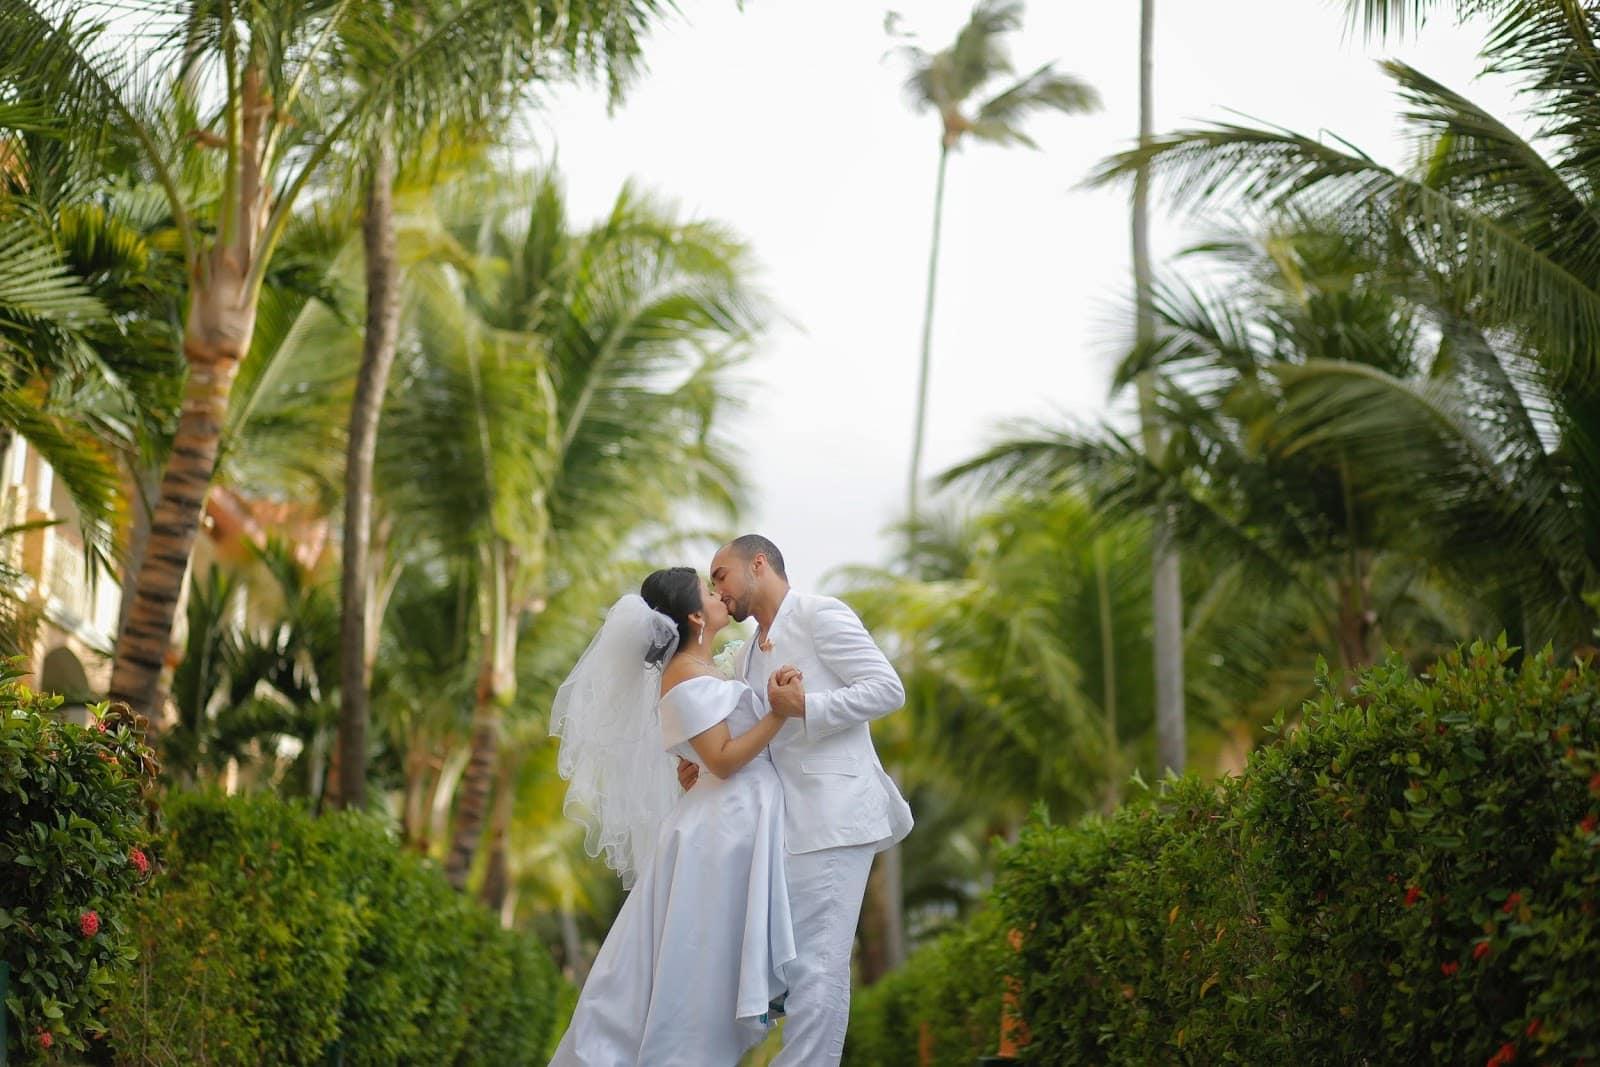 Affordable Luxury - Budget Savvy Honeymoon Destinations